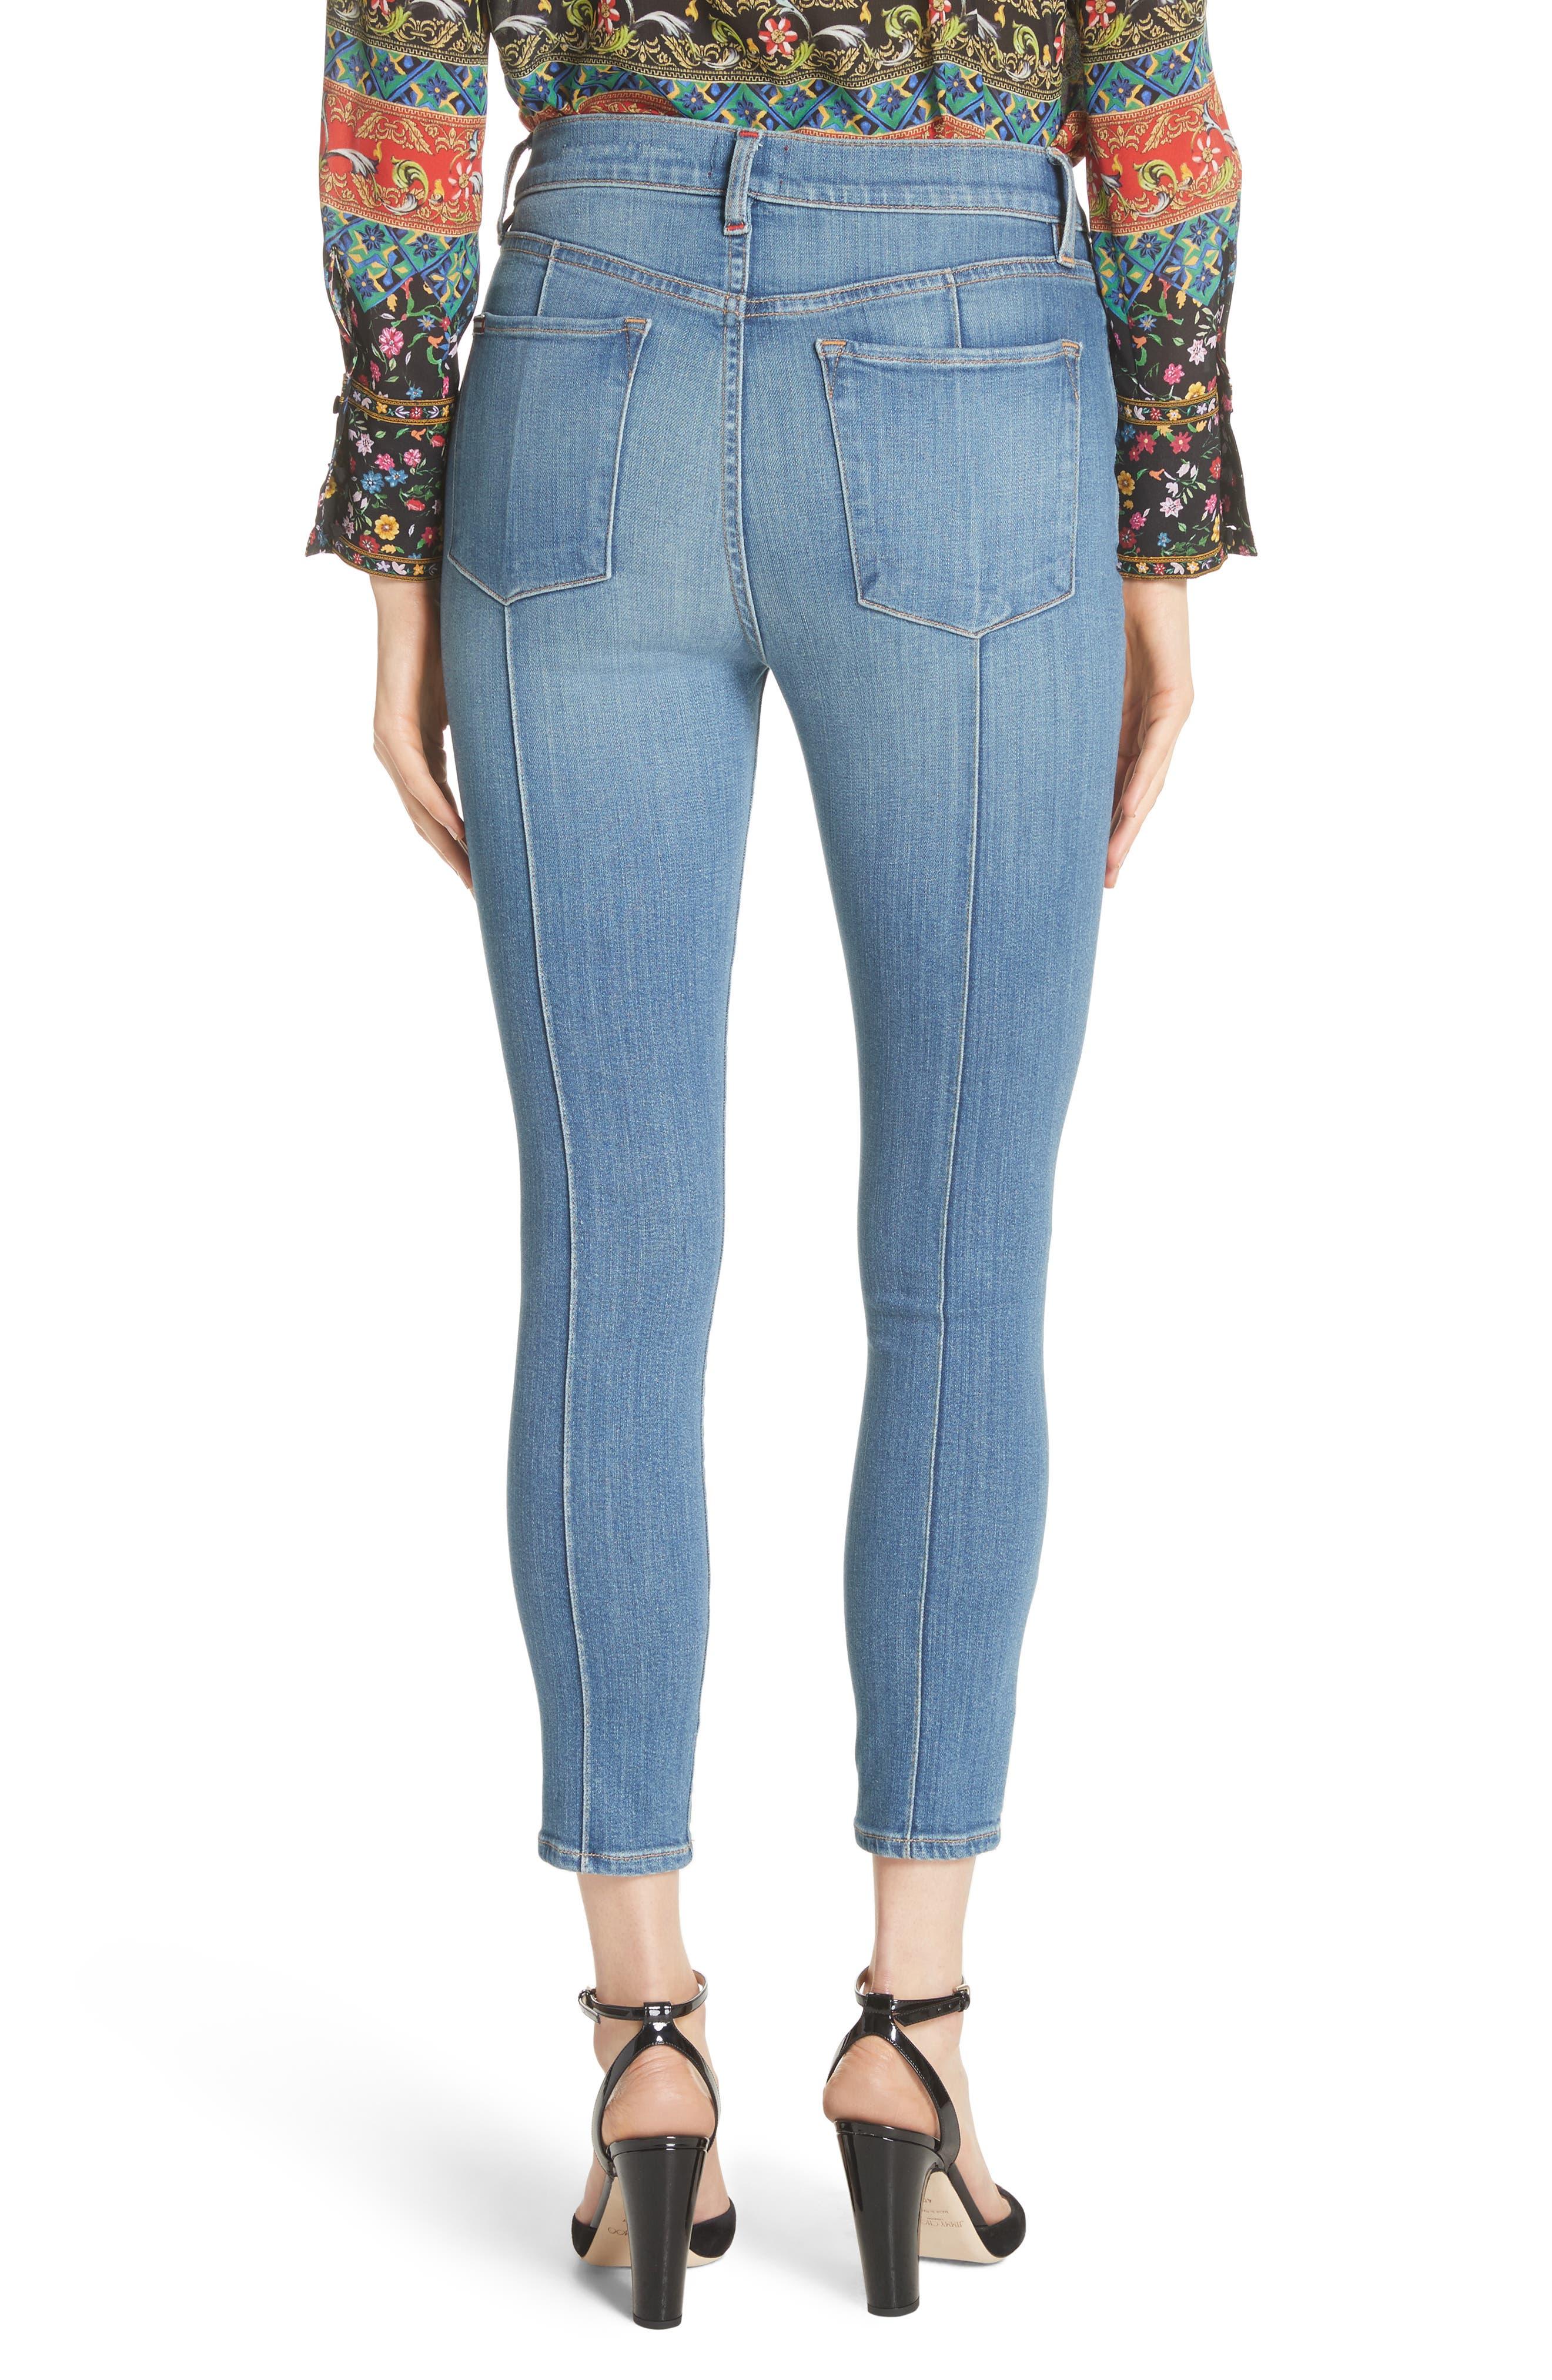 AO.LA Good High Waist Pintuck Skinny Jeans,                             Alternate thumbnail 2, color,                             482